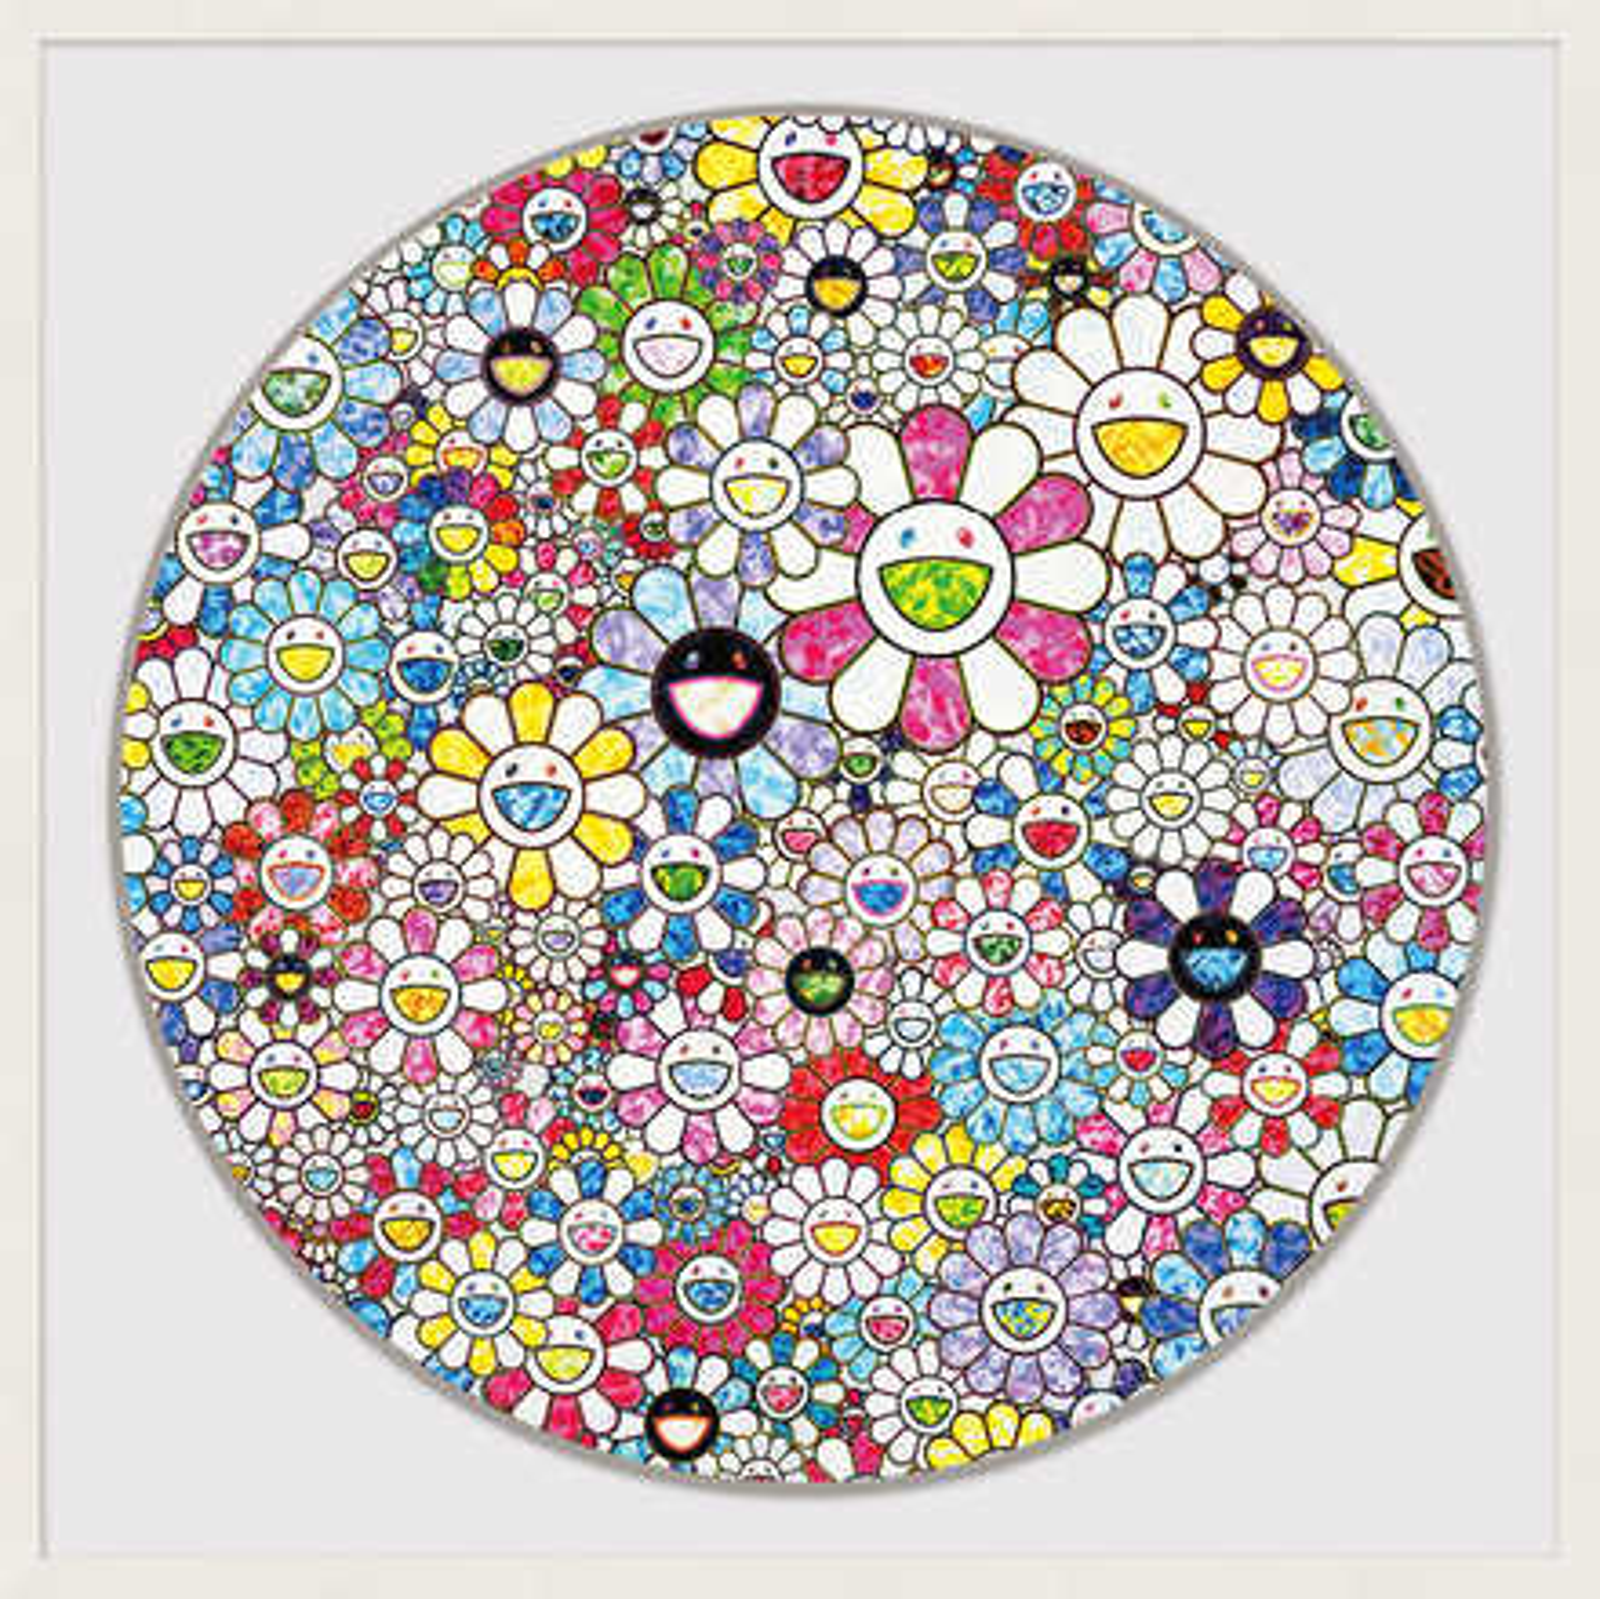 Celestial Flowers - Takashi Murakami